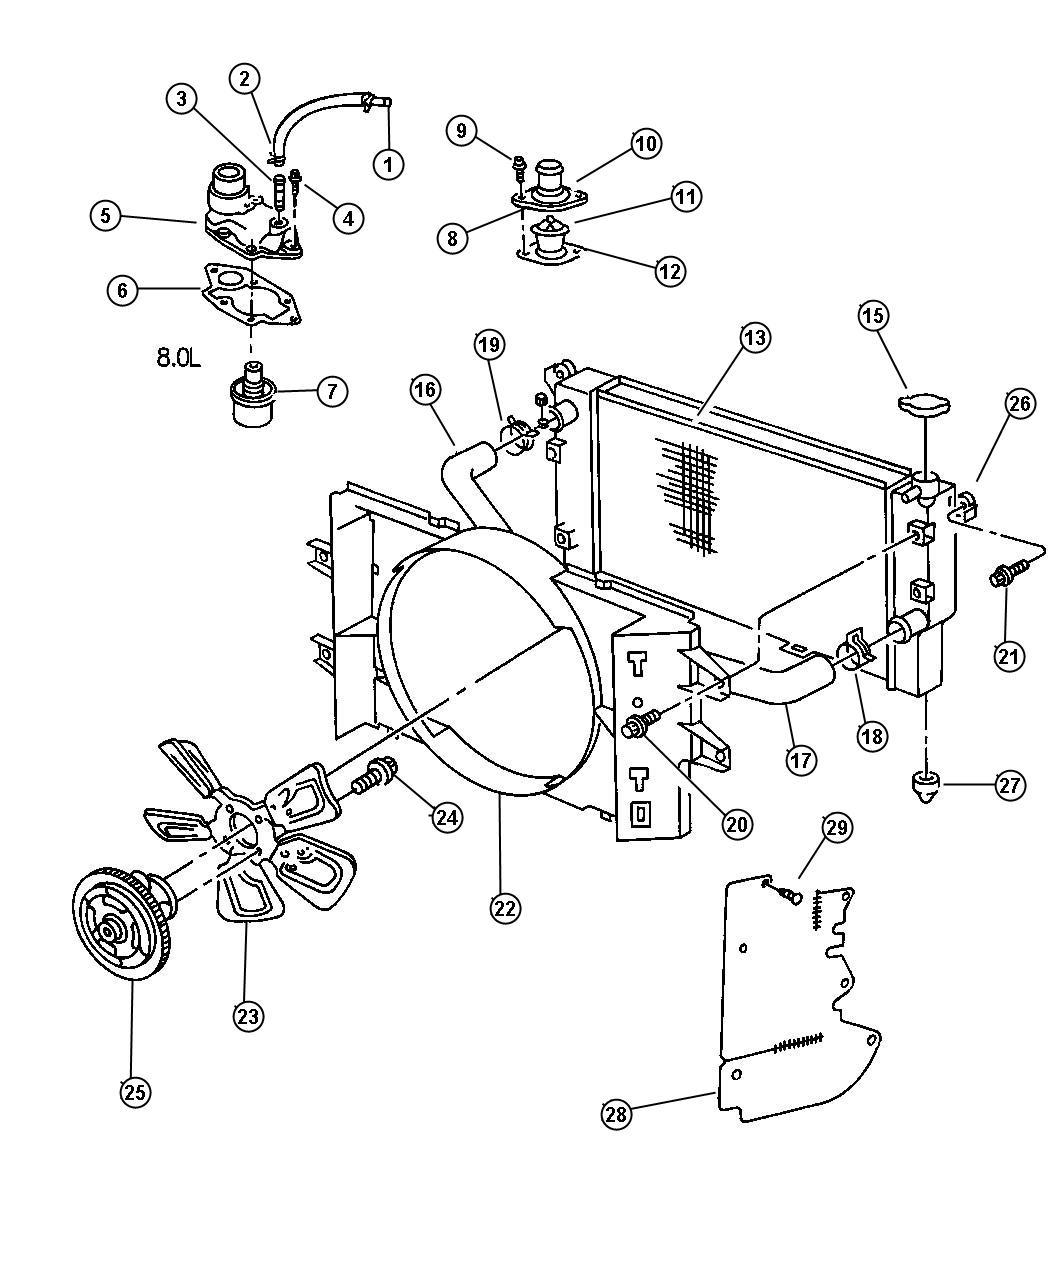 tl1000r headlight wiring diagram